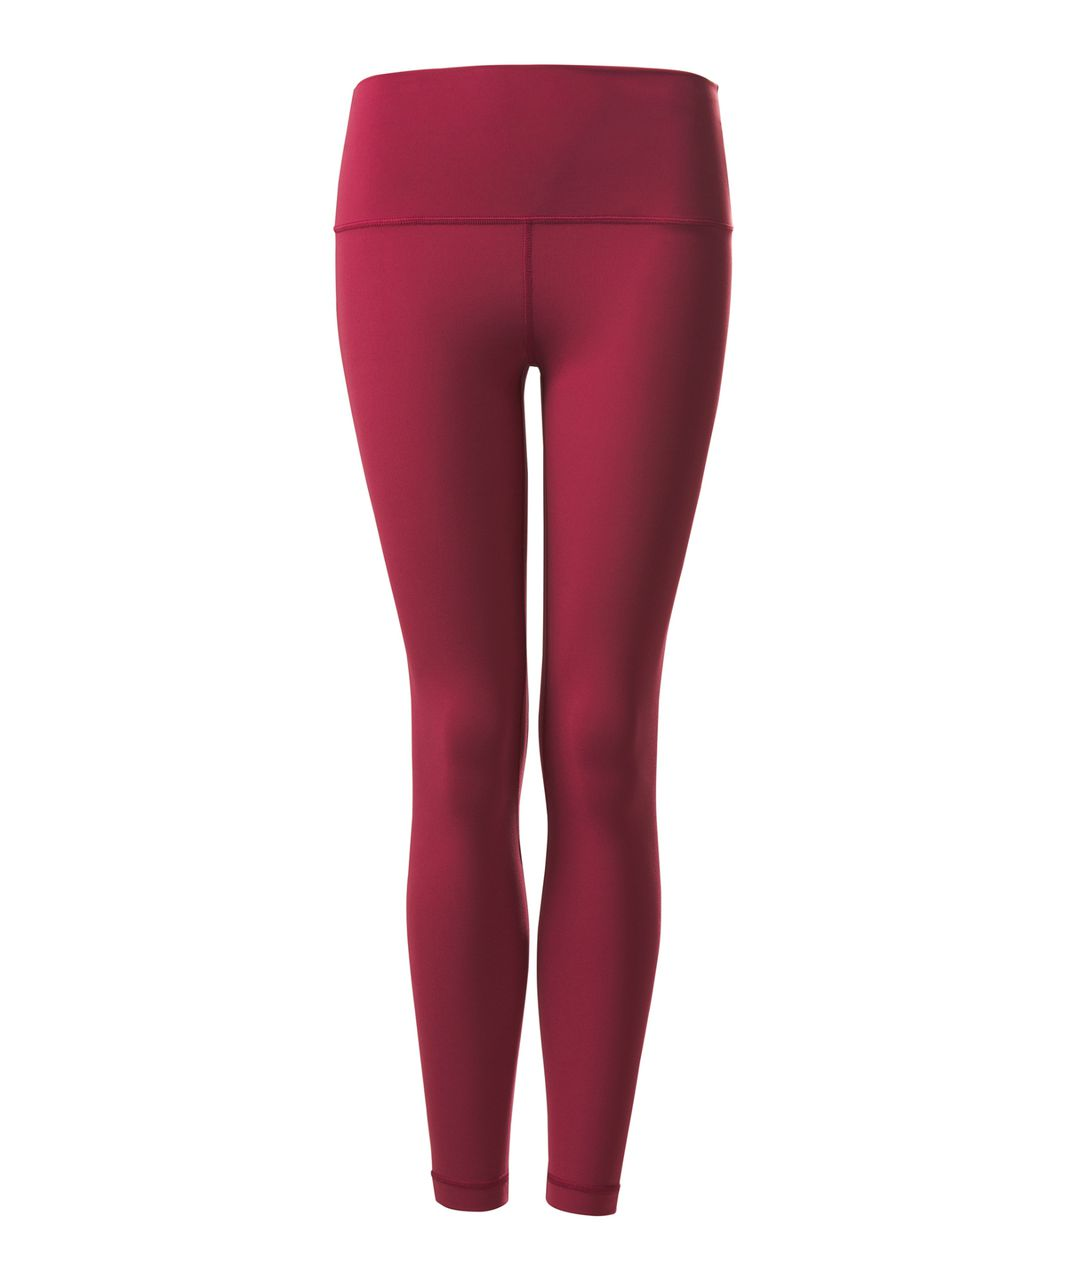 Lululemon Align Pant II - Rosewood